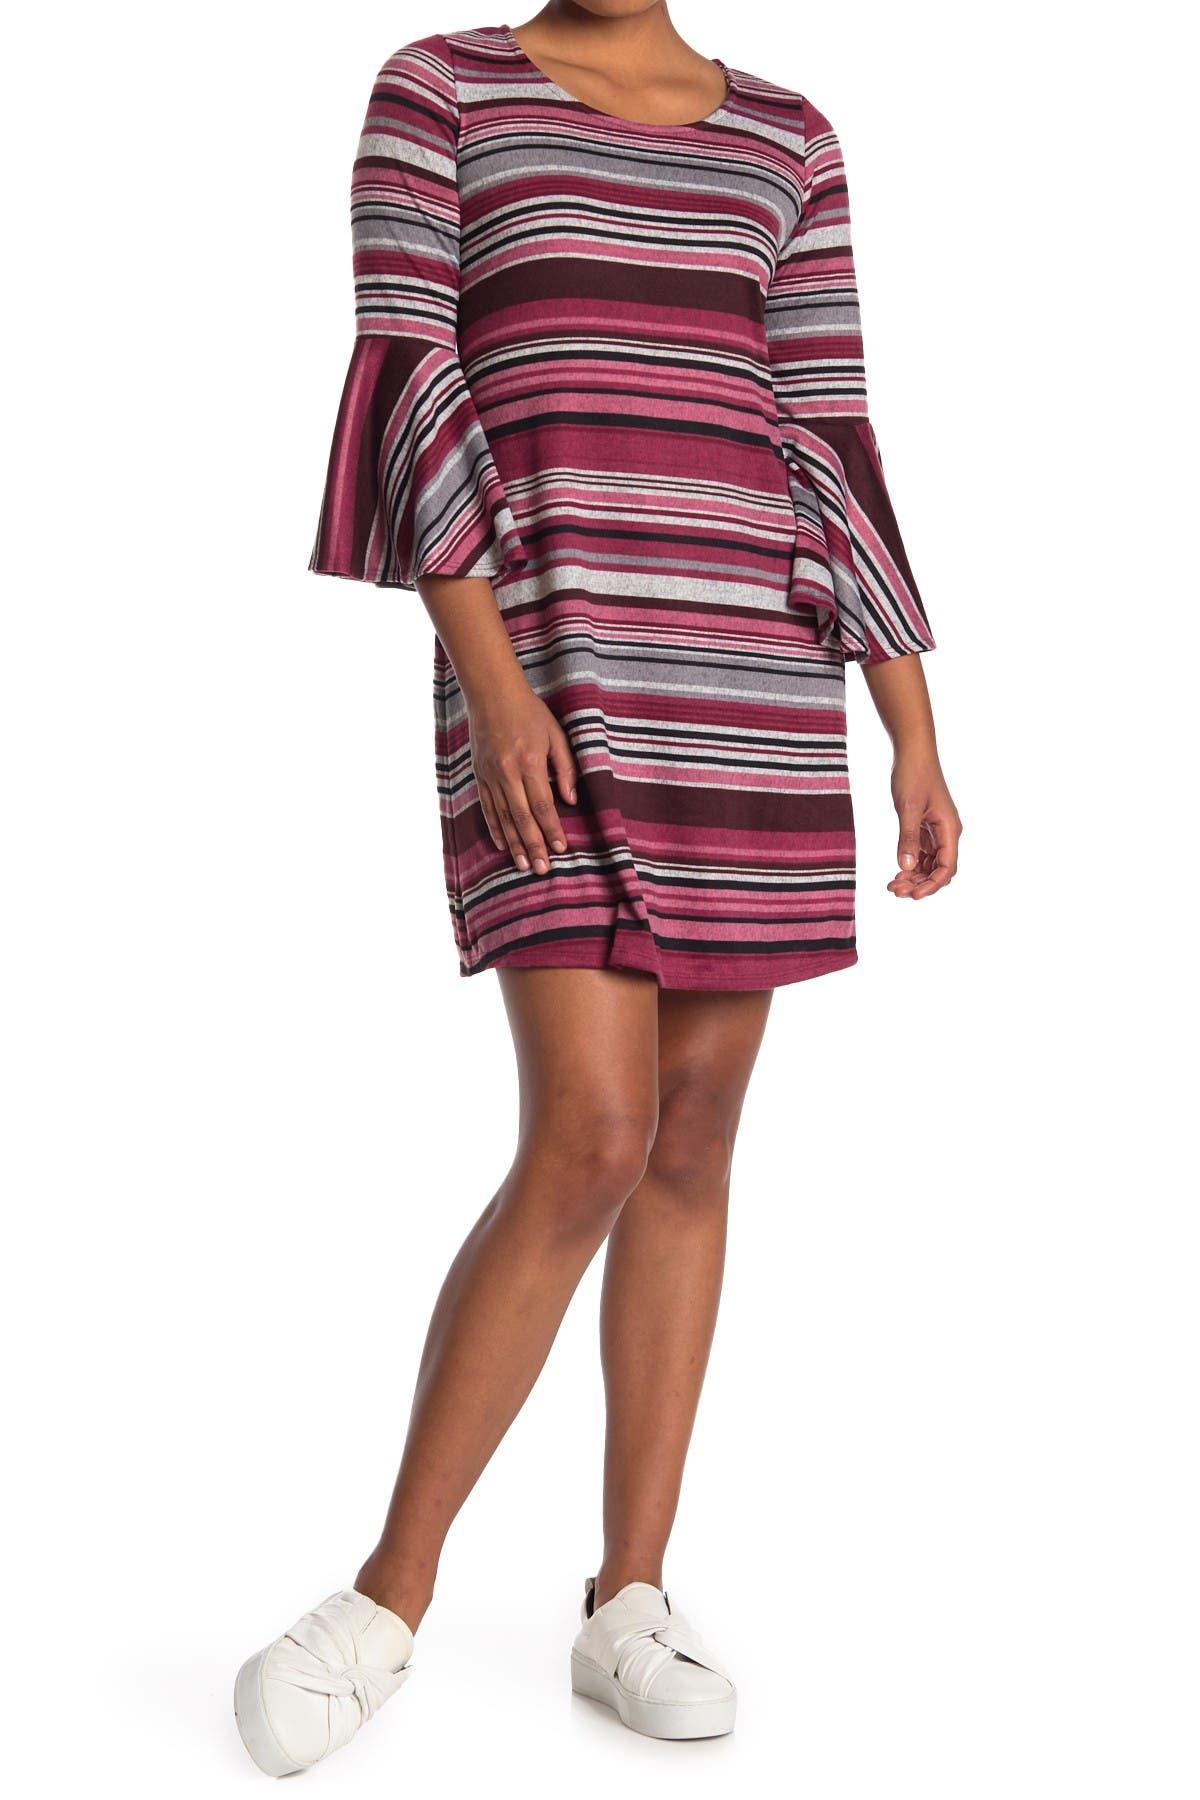 Image of TASH + SOPHIE Cozy Stripe A-Line Dress